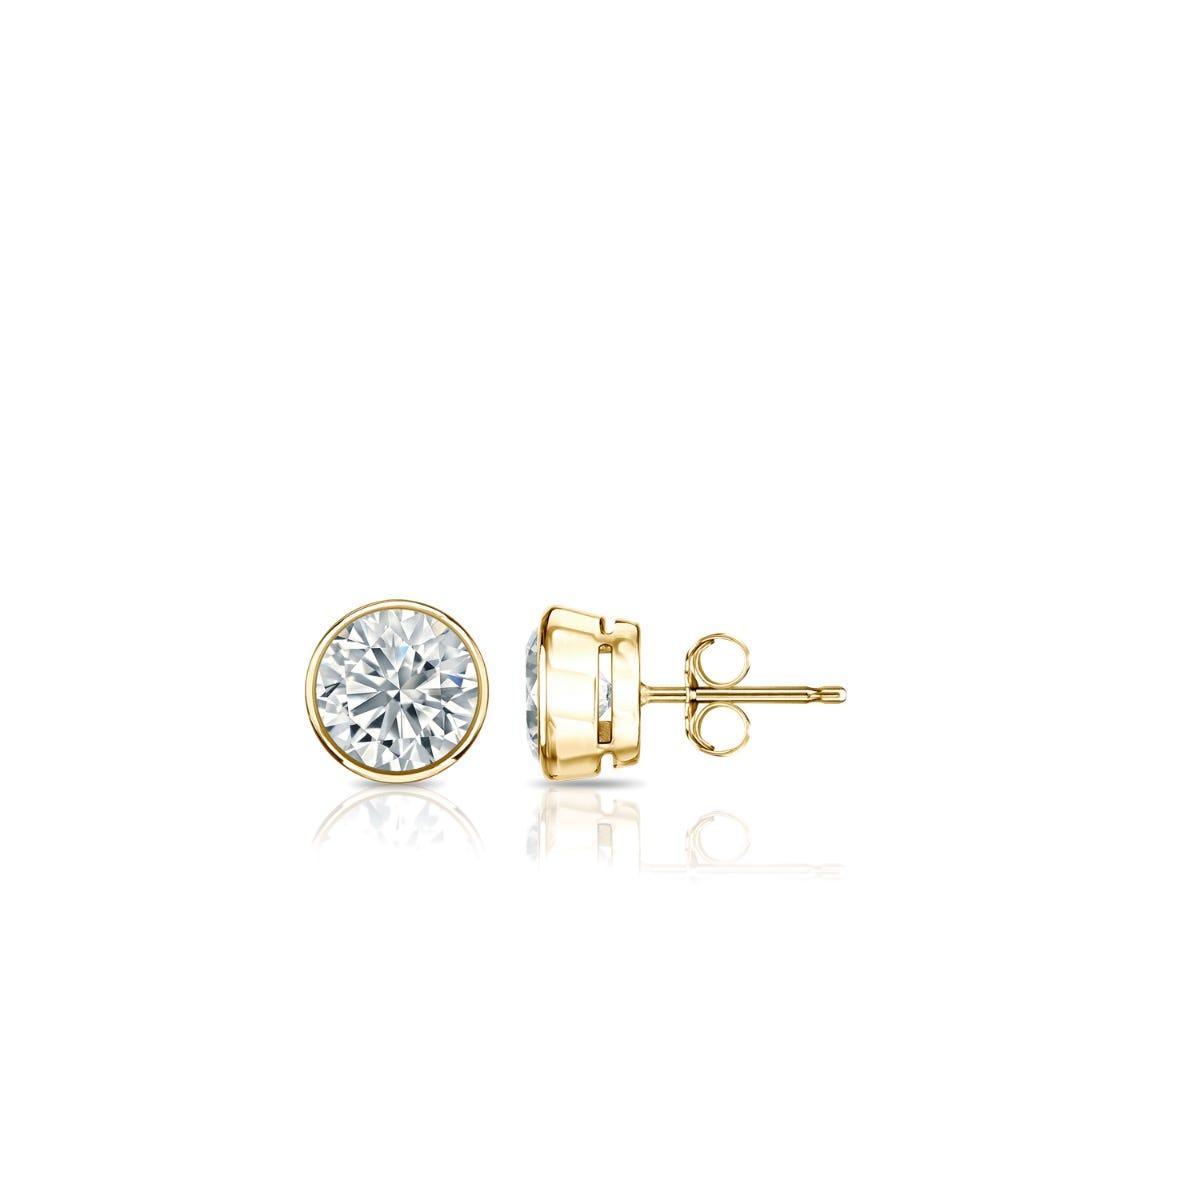 Diamond Round Bezel-Set 1/7ctw. Solitaire Stud (IJ-I2) Earrings in 10K Yellow Gold